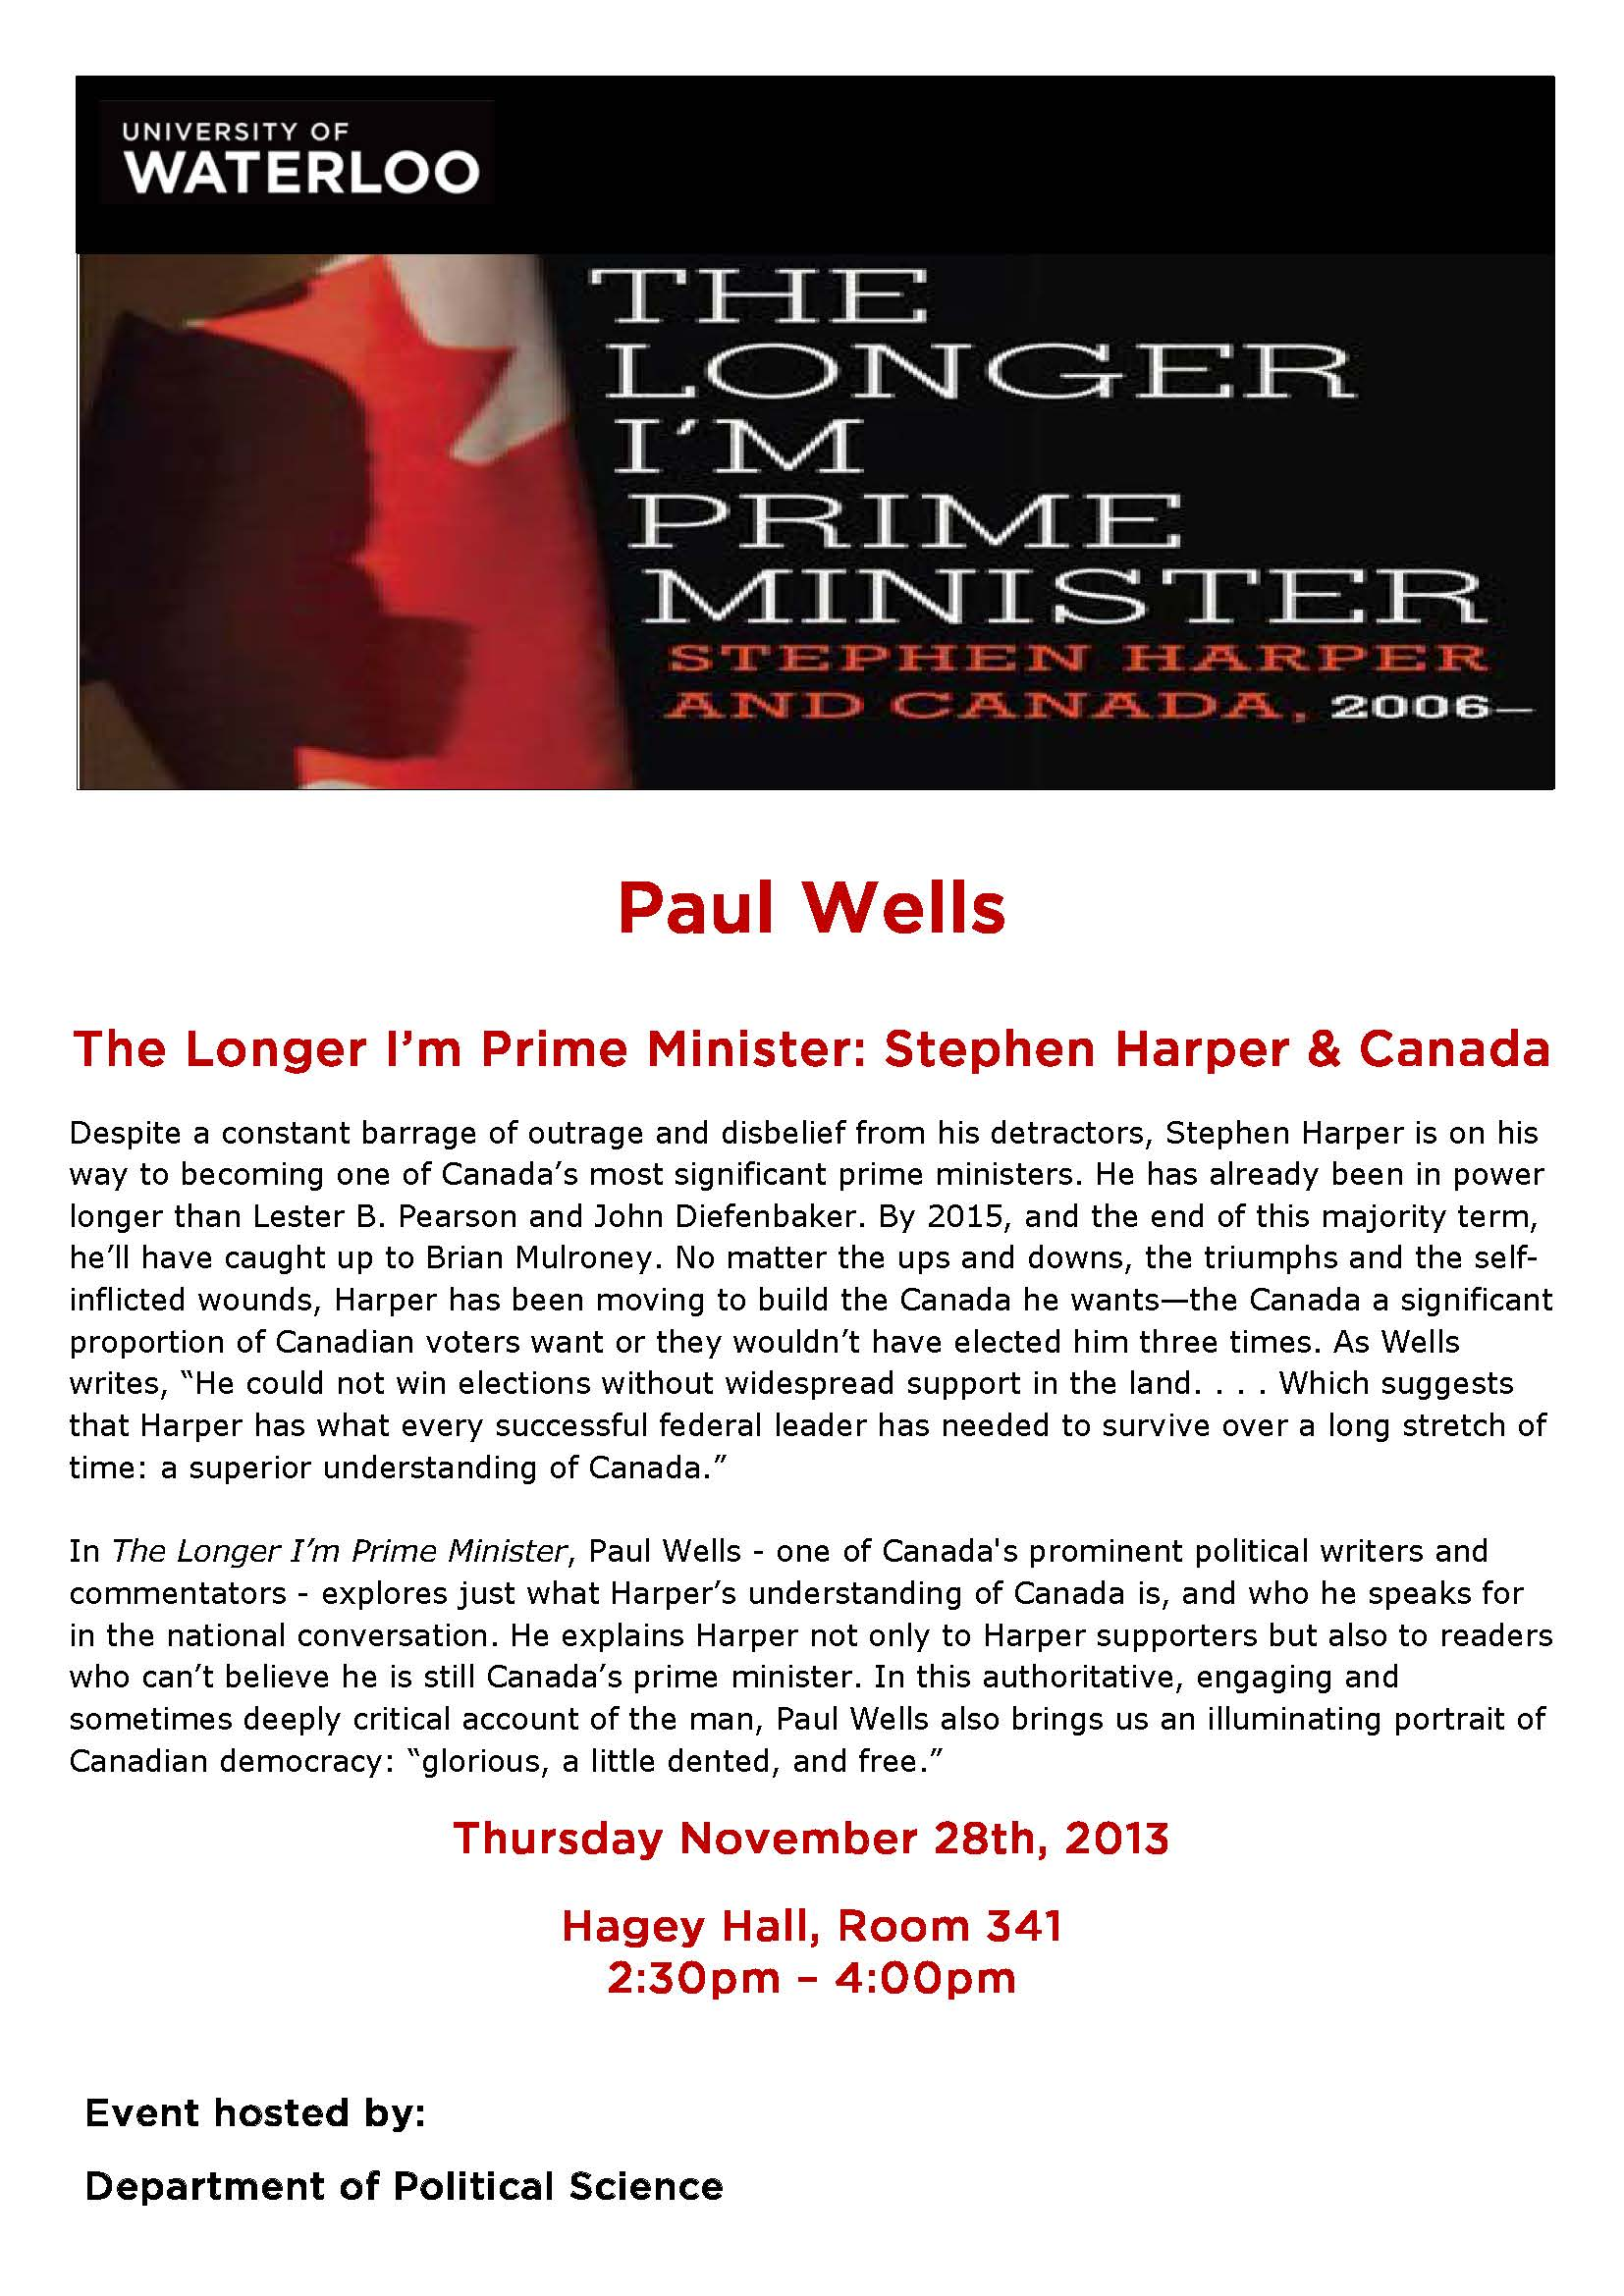 Paul Wells poster